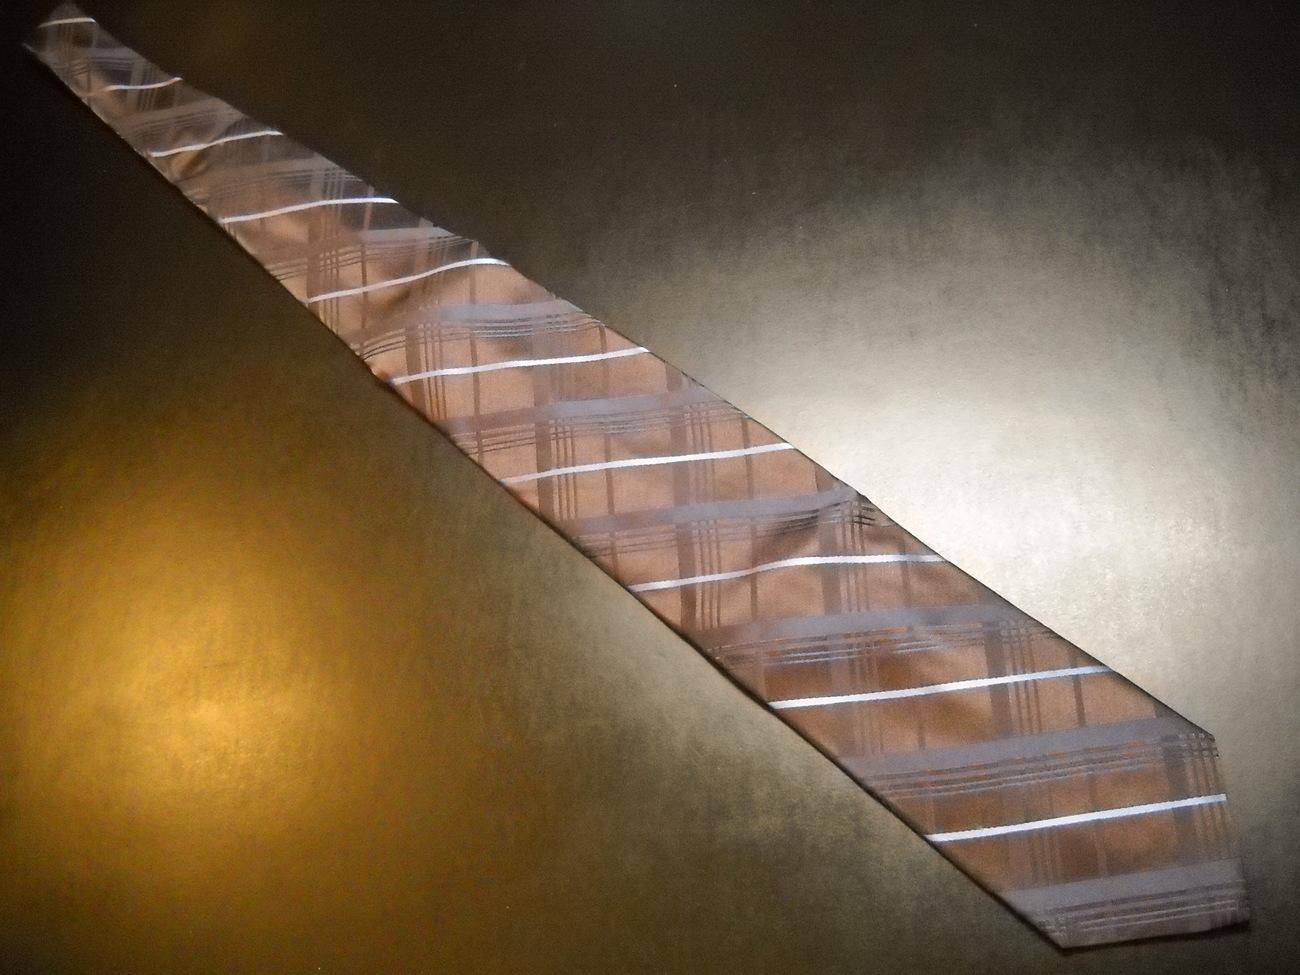 Joseph Abboud Neck Tie Joe Dark Brown with Diagonal Stripes Blues Imported Silk